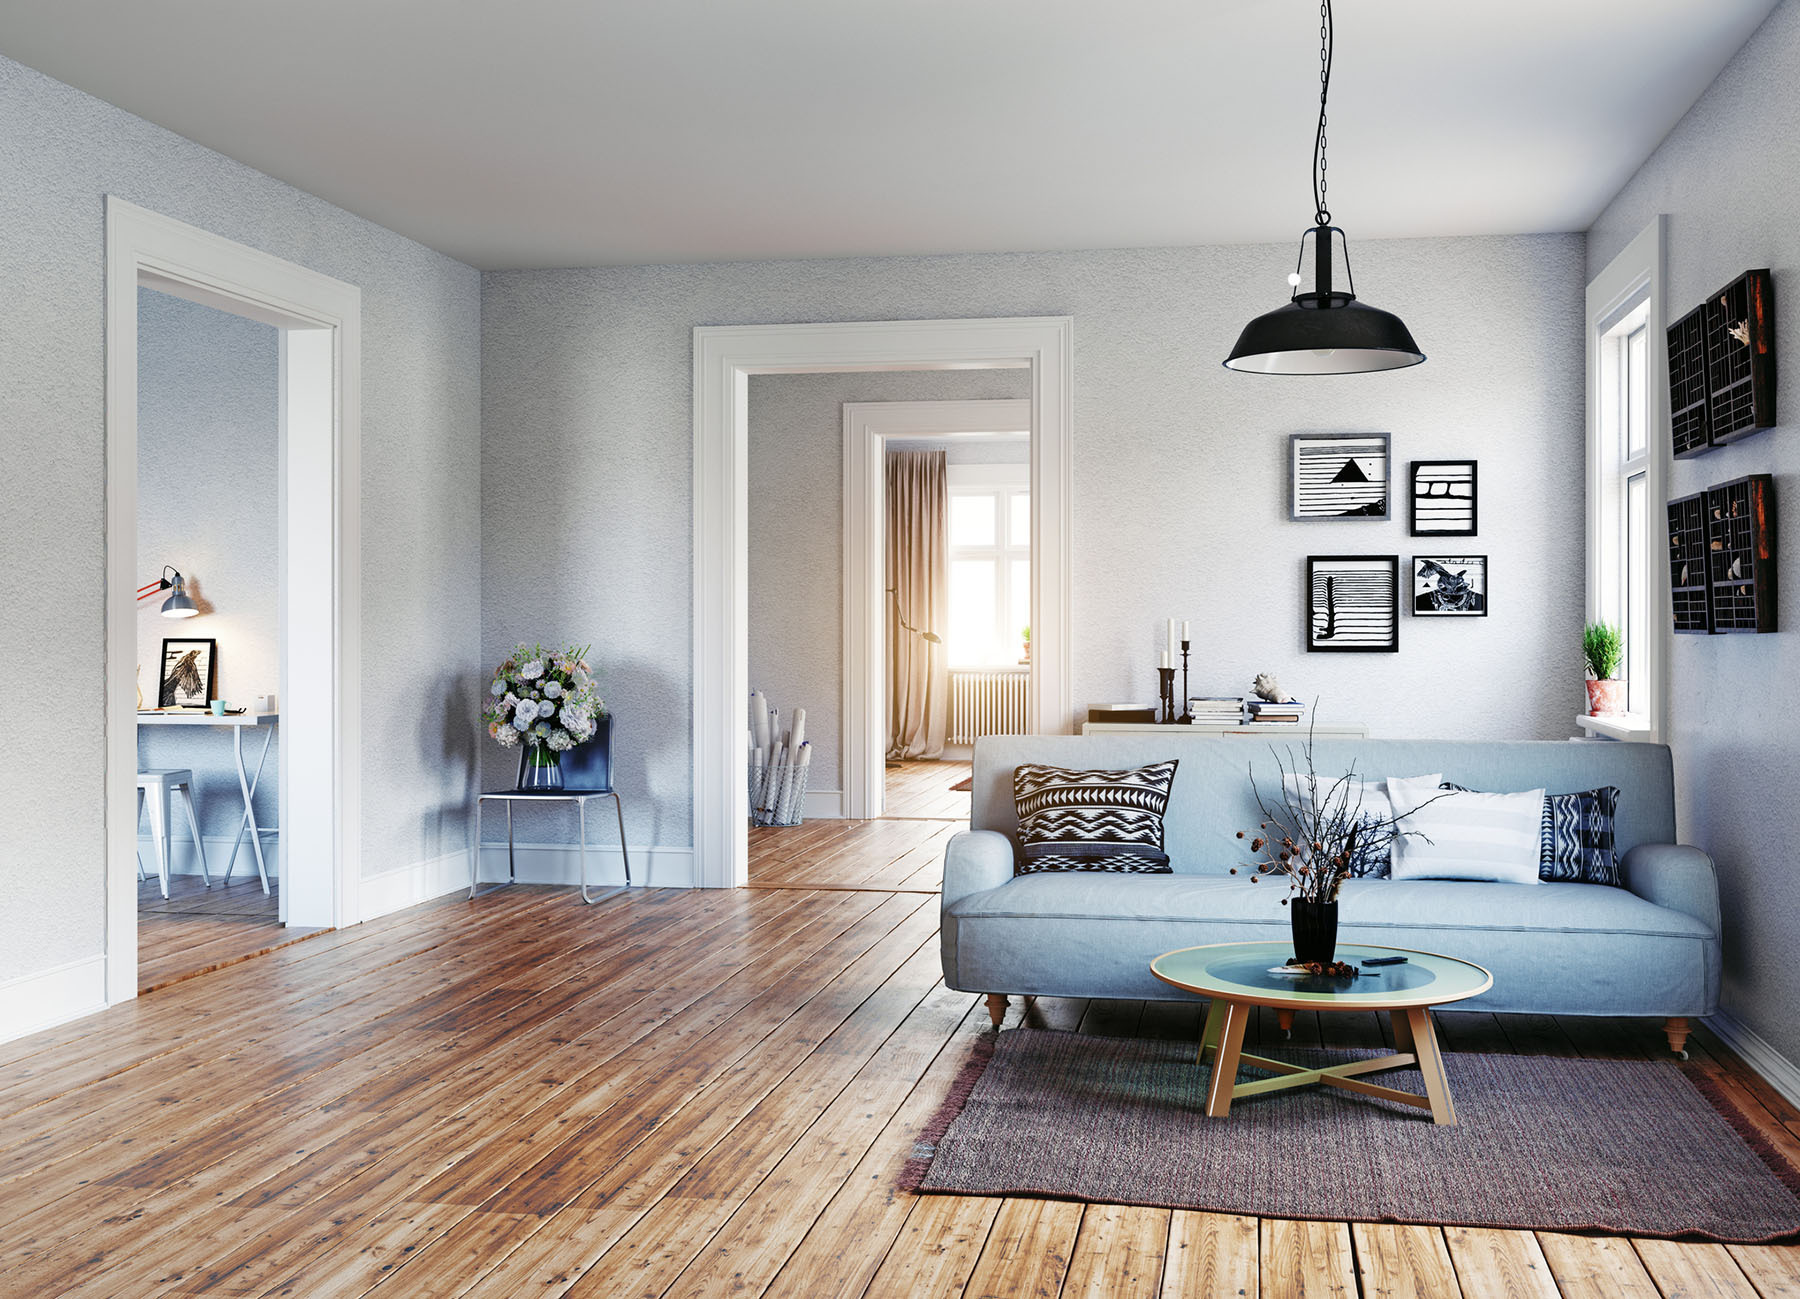 bien choisir la teinte de son parquet lorraine magazine. Black Bedroom Furniture Sets. Home Design Ideas